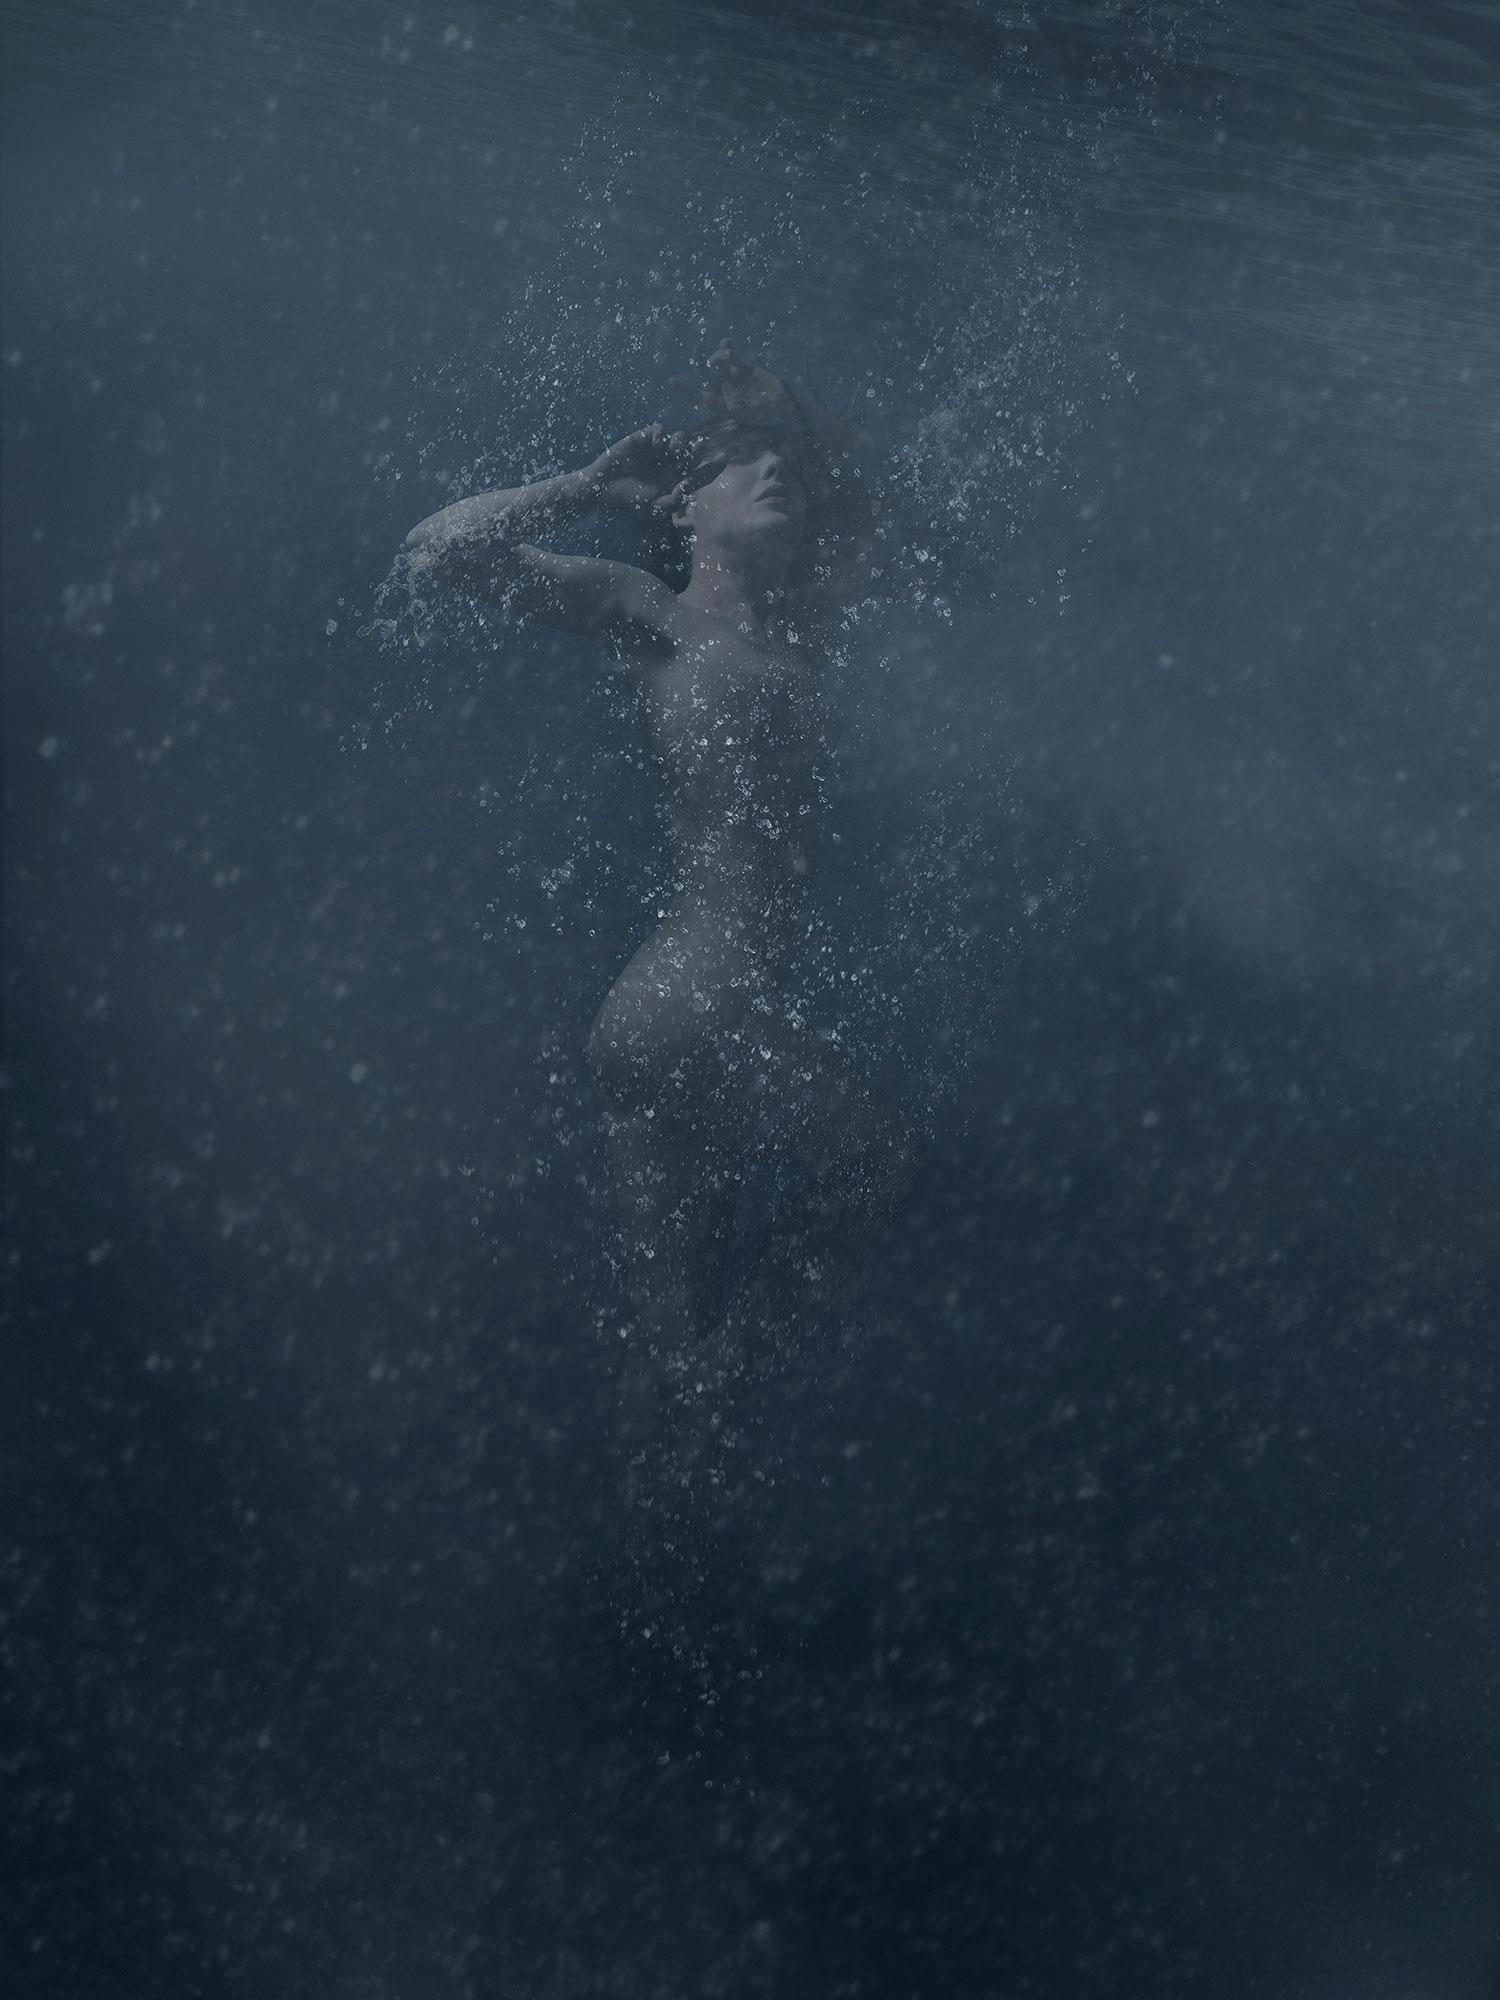 compositing-combination-print-3d-vue-water-cgi-underwater